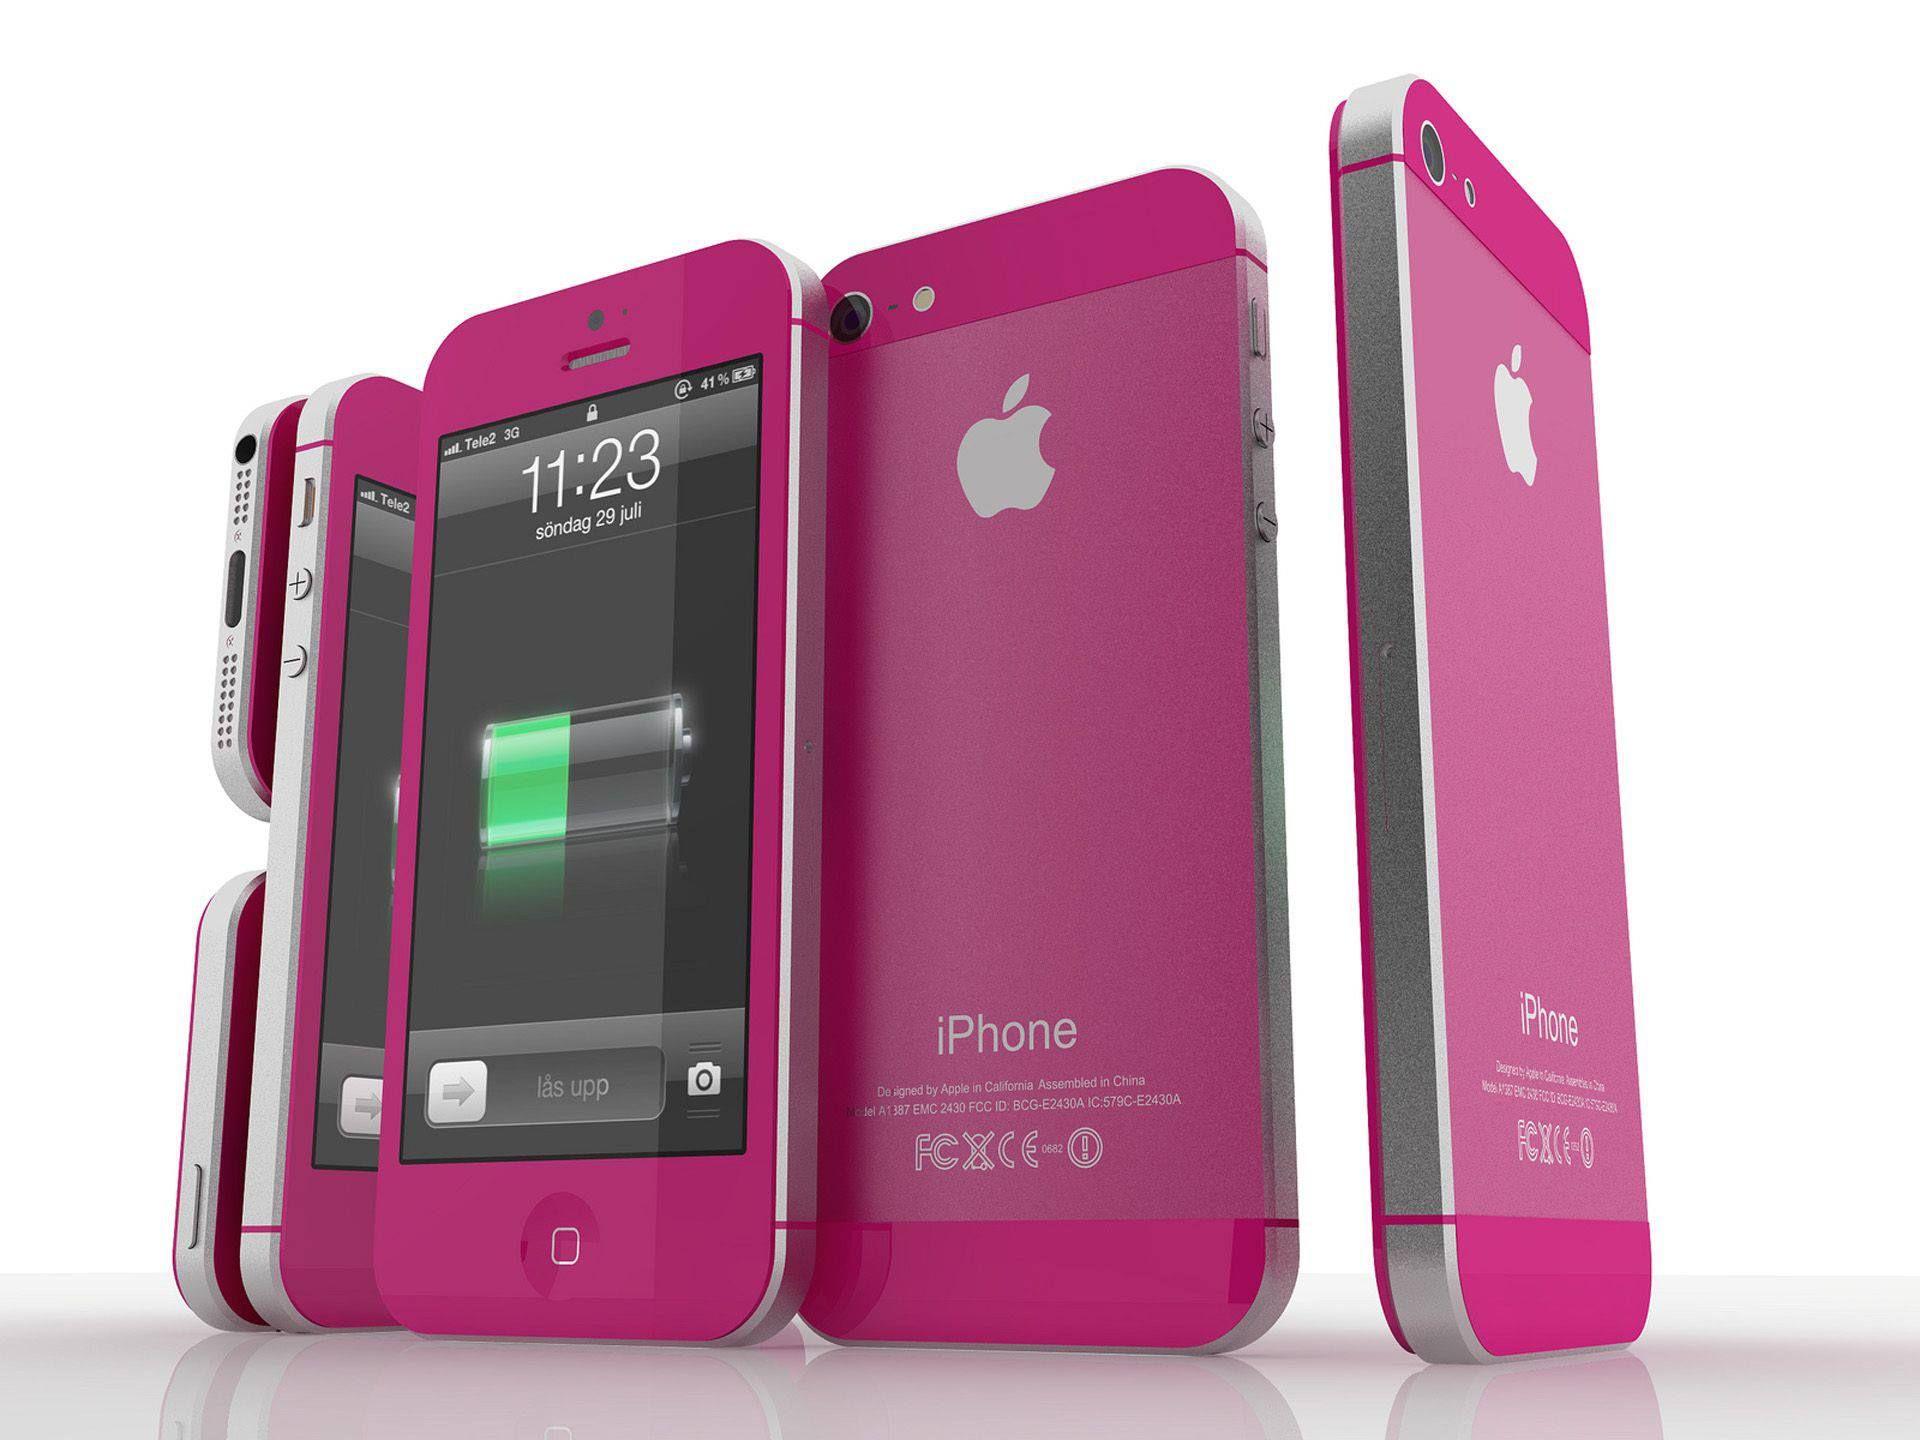 Iphone pink Iphone, Pink iphone, Smartphone